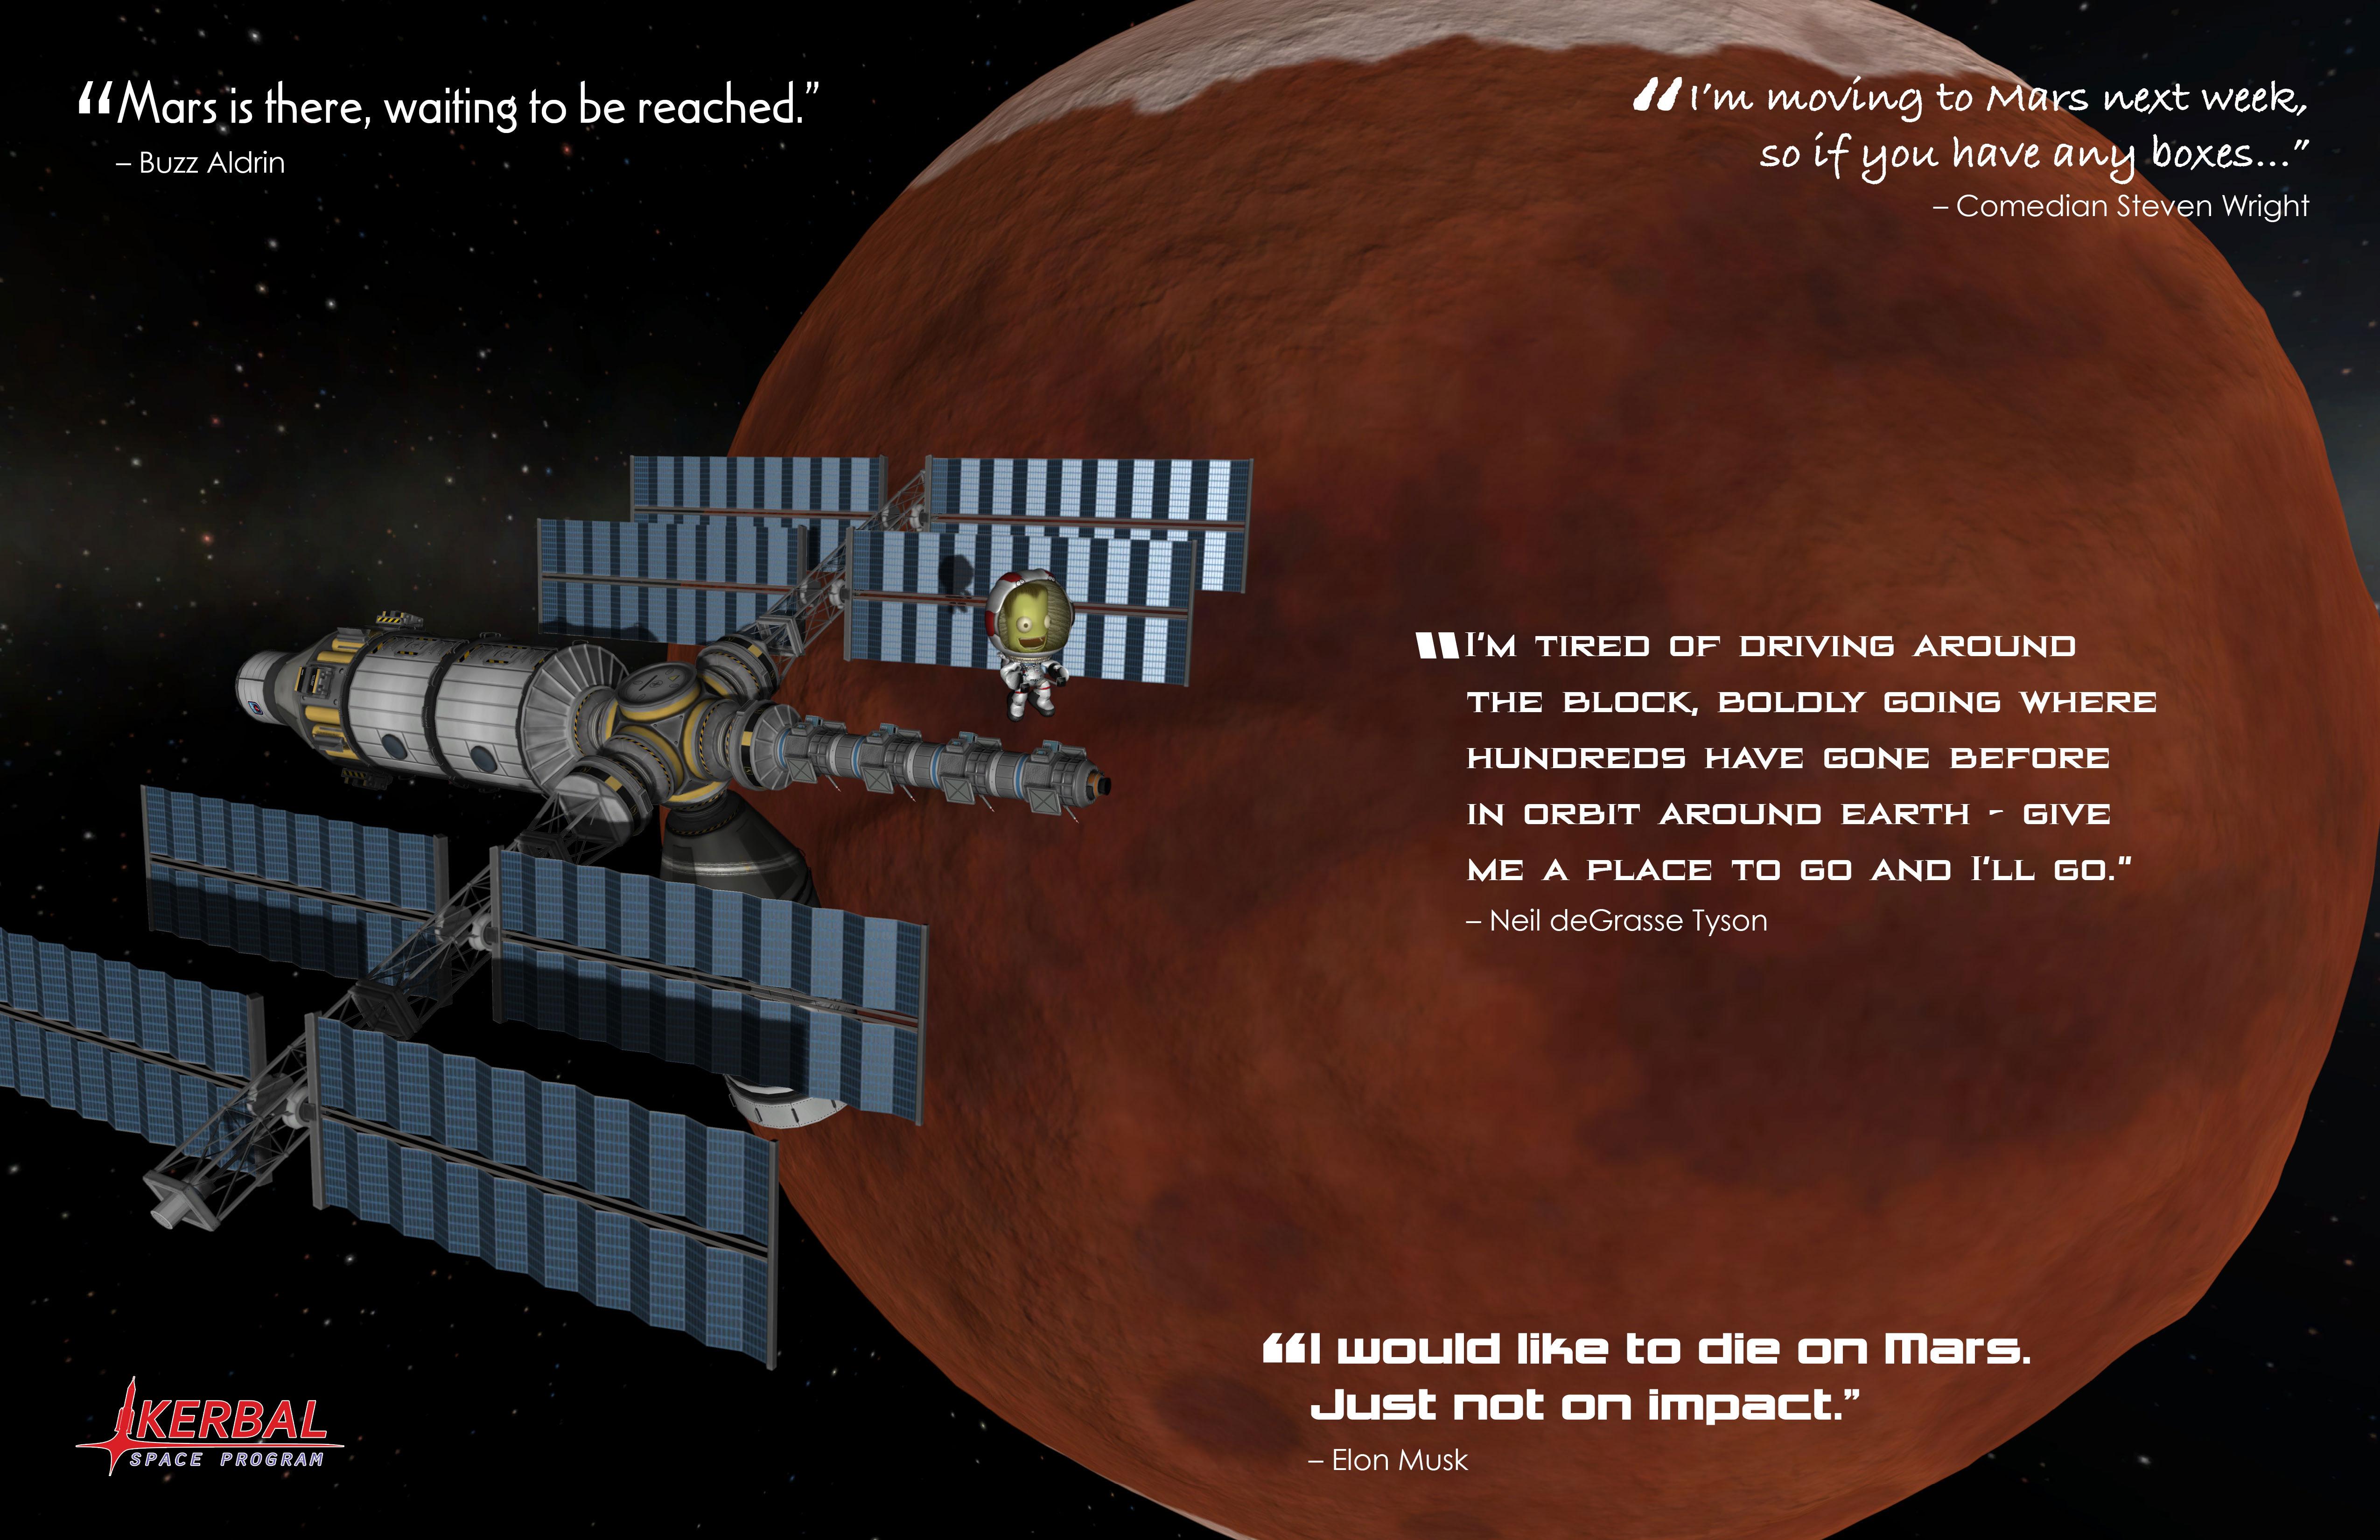 KERBAL SPACE PROGRAM DUNA (Mars) POSTER. Credit: Squad, Monkey Squad S.A de C.V.